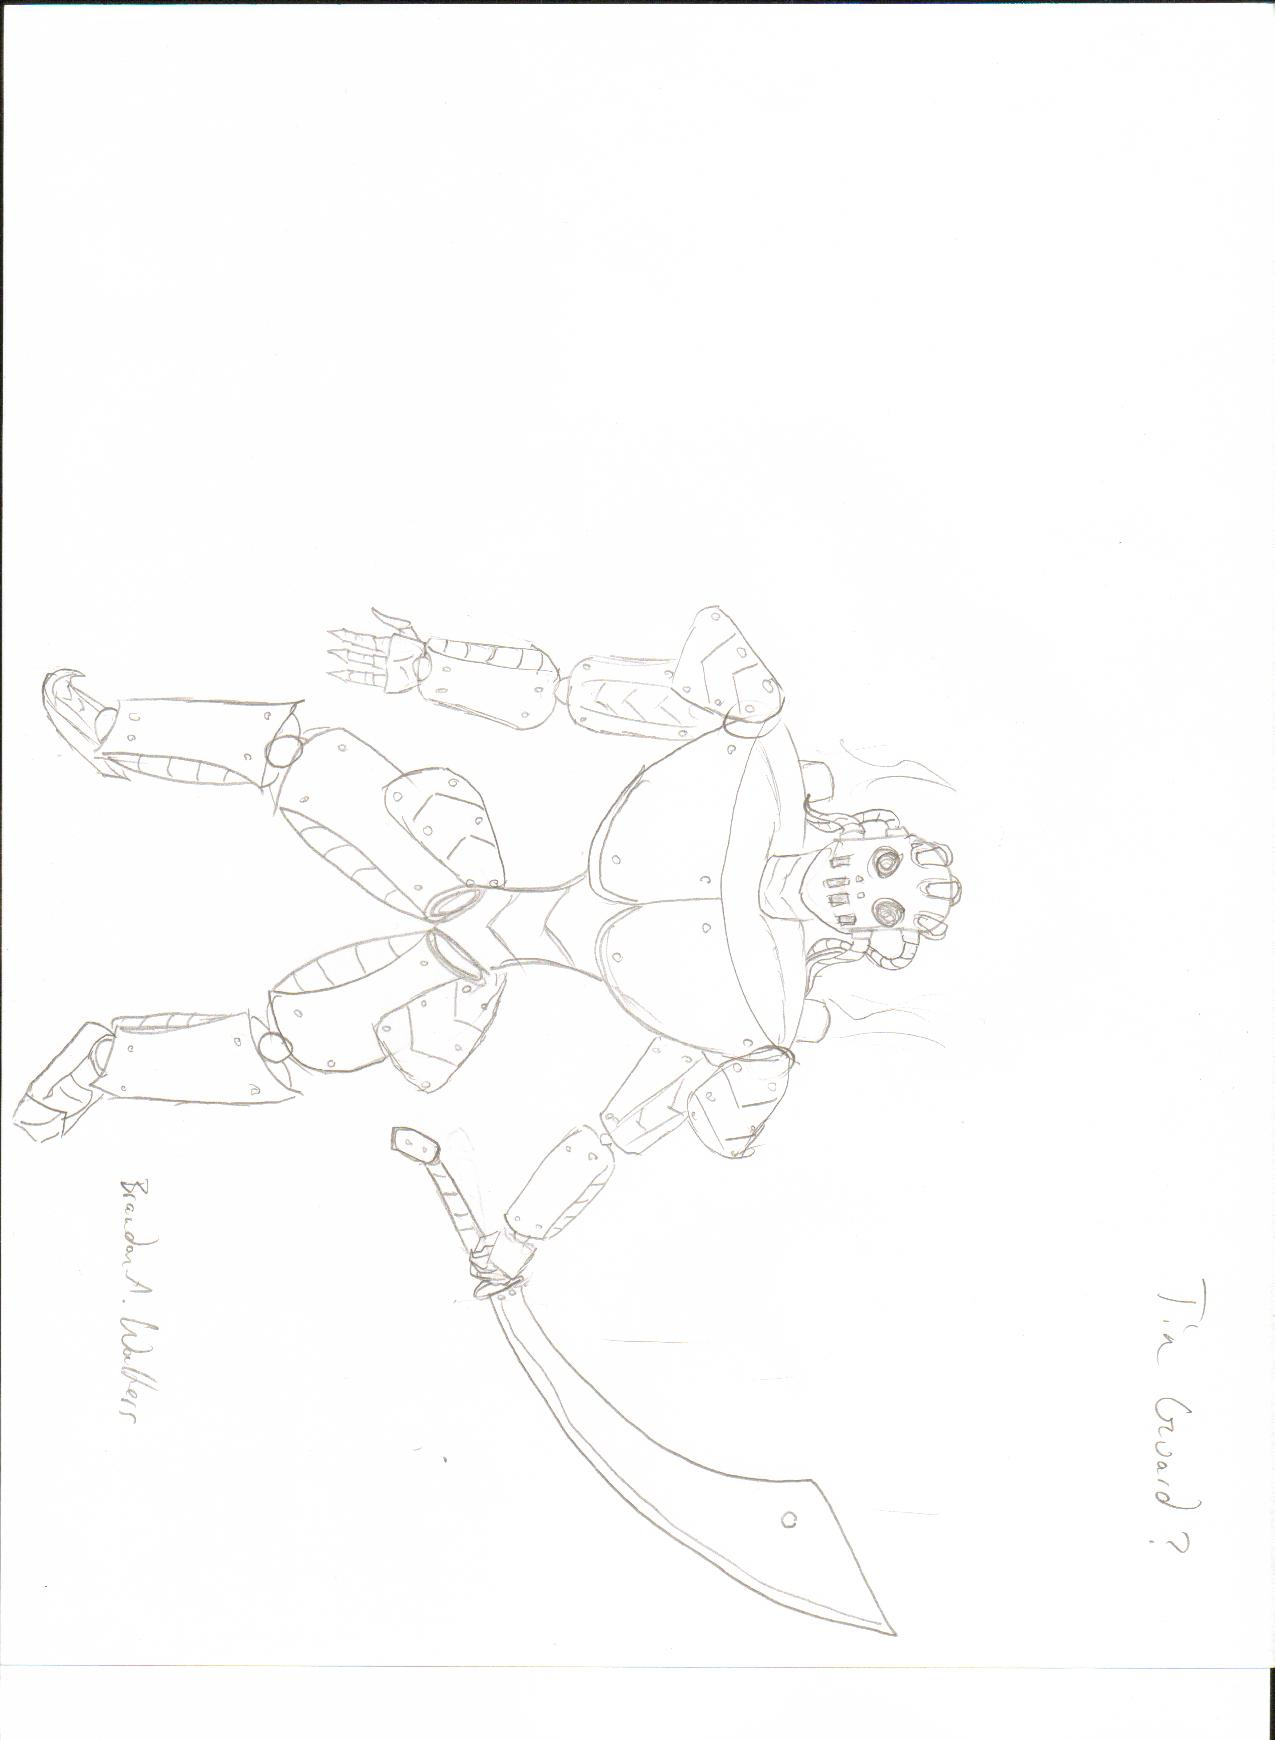 The tin guard sketch